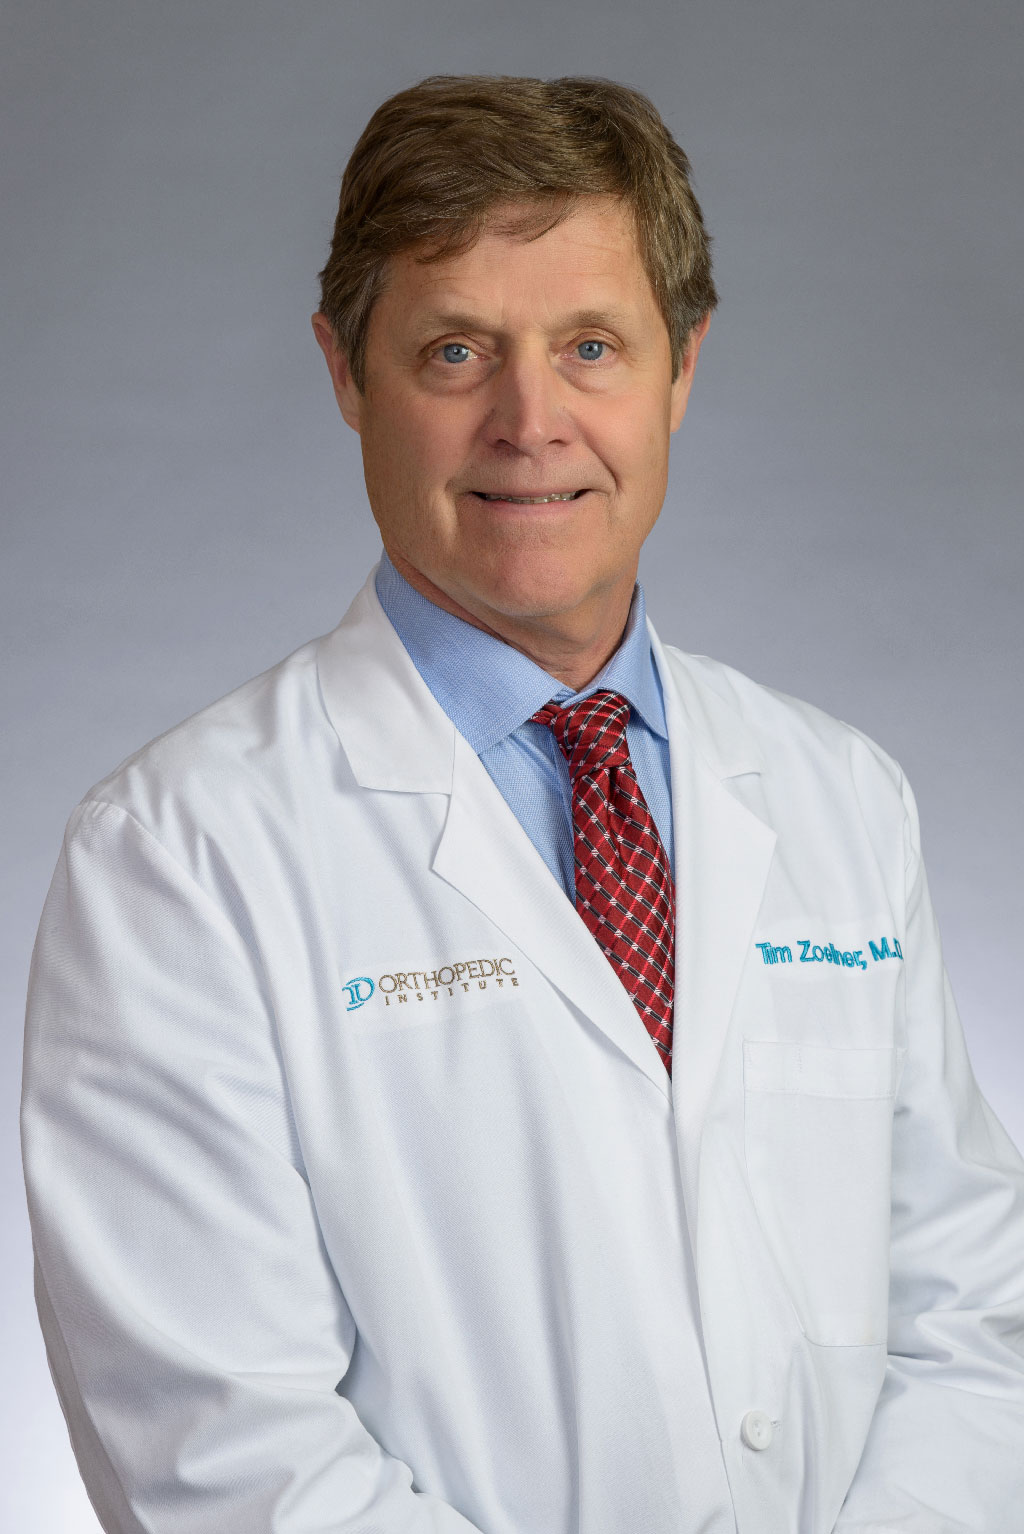 Timothy M. Zoellner, MD